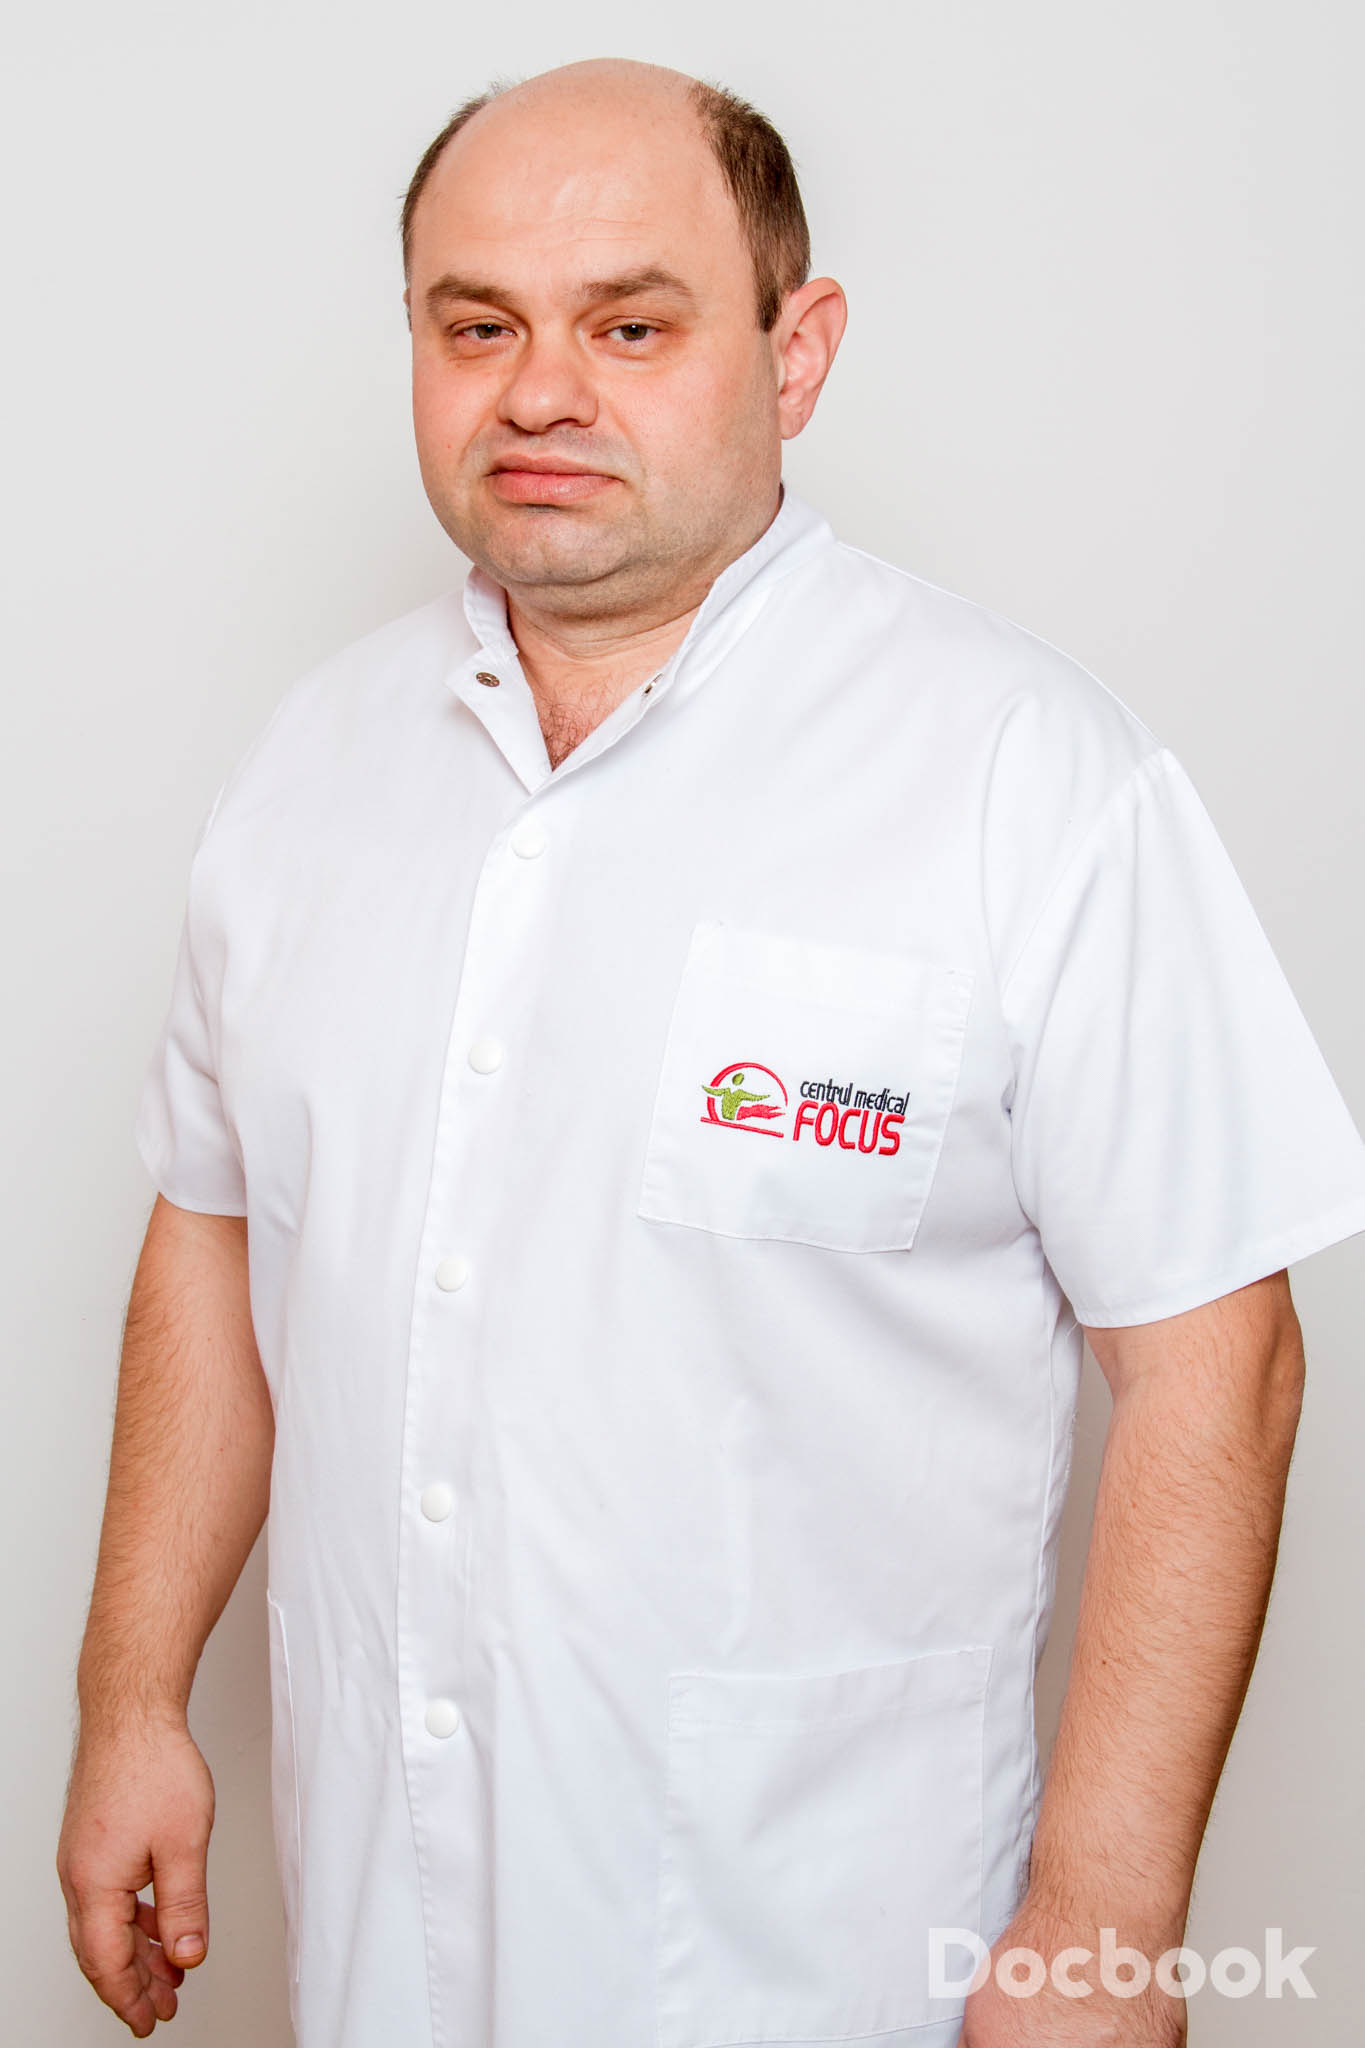 Dr. Iurie Hincu